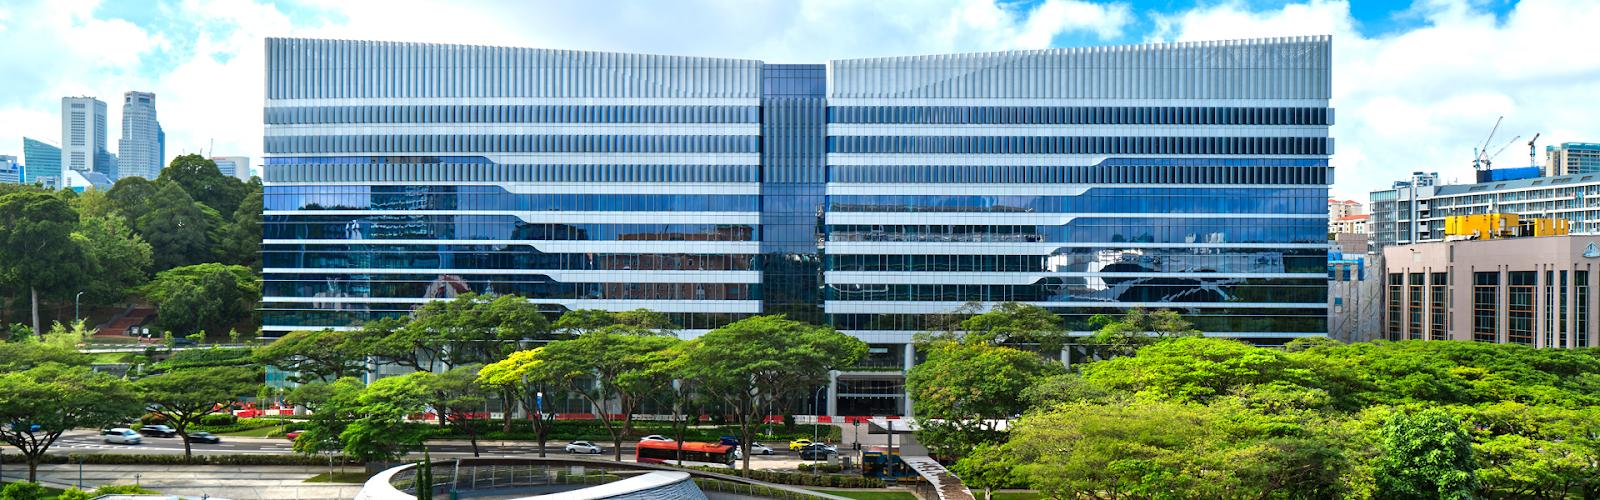 Suntec REIT - Singapore Property, 9 Penang Road